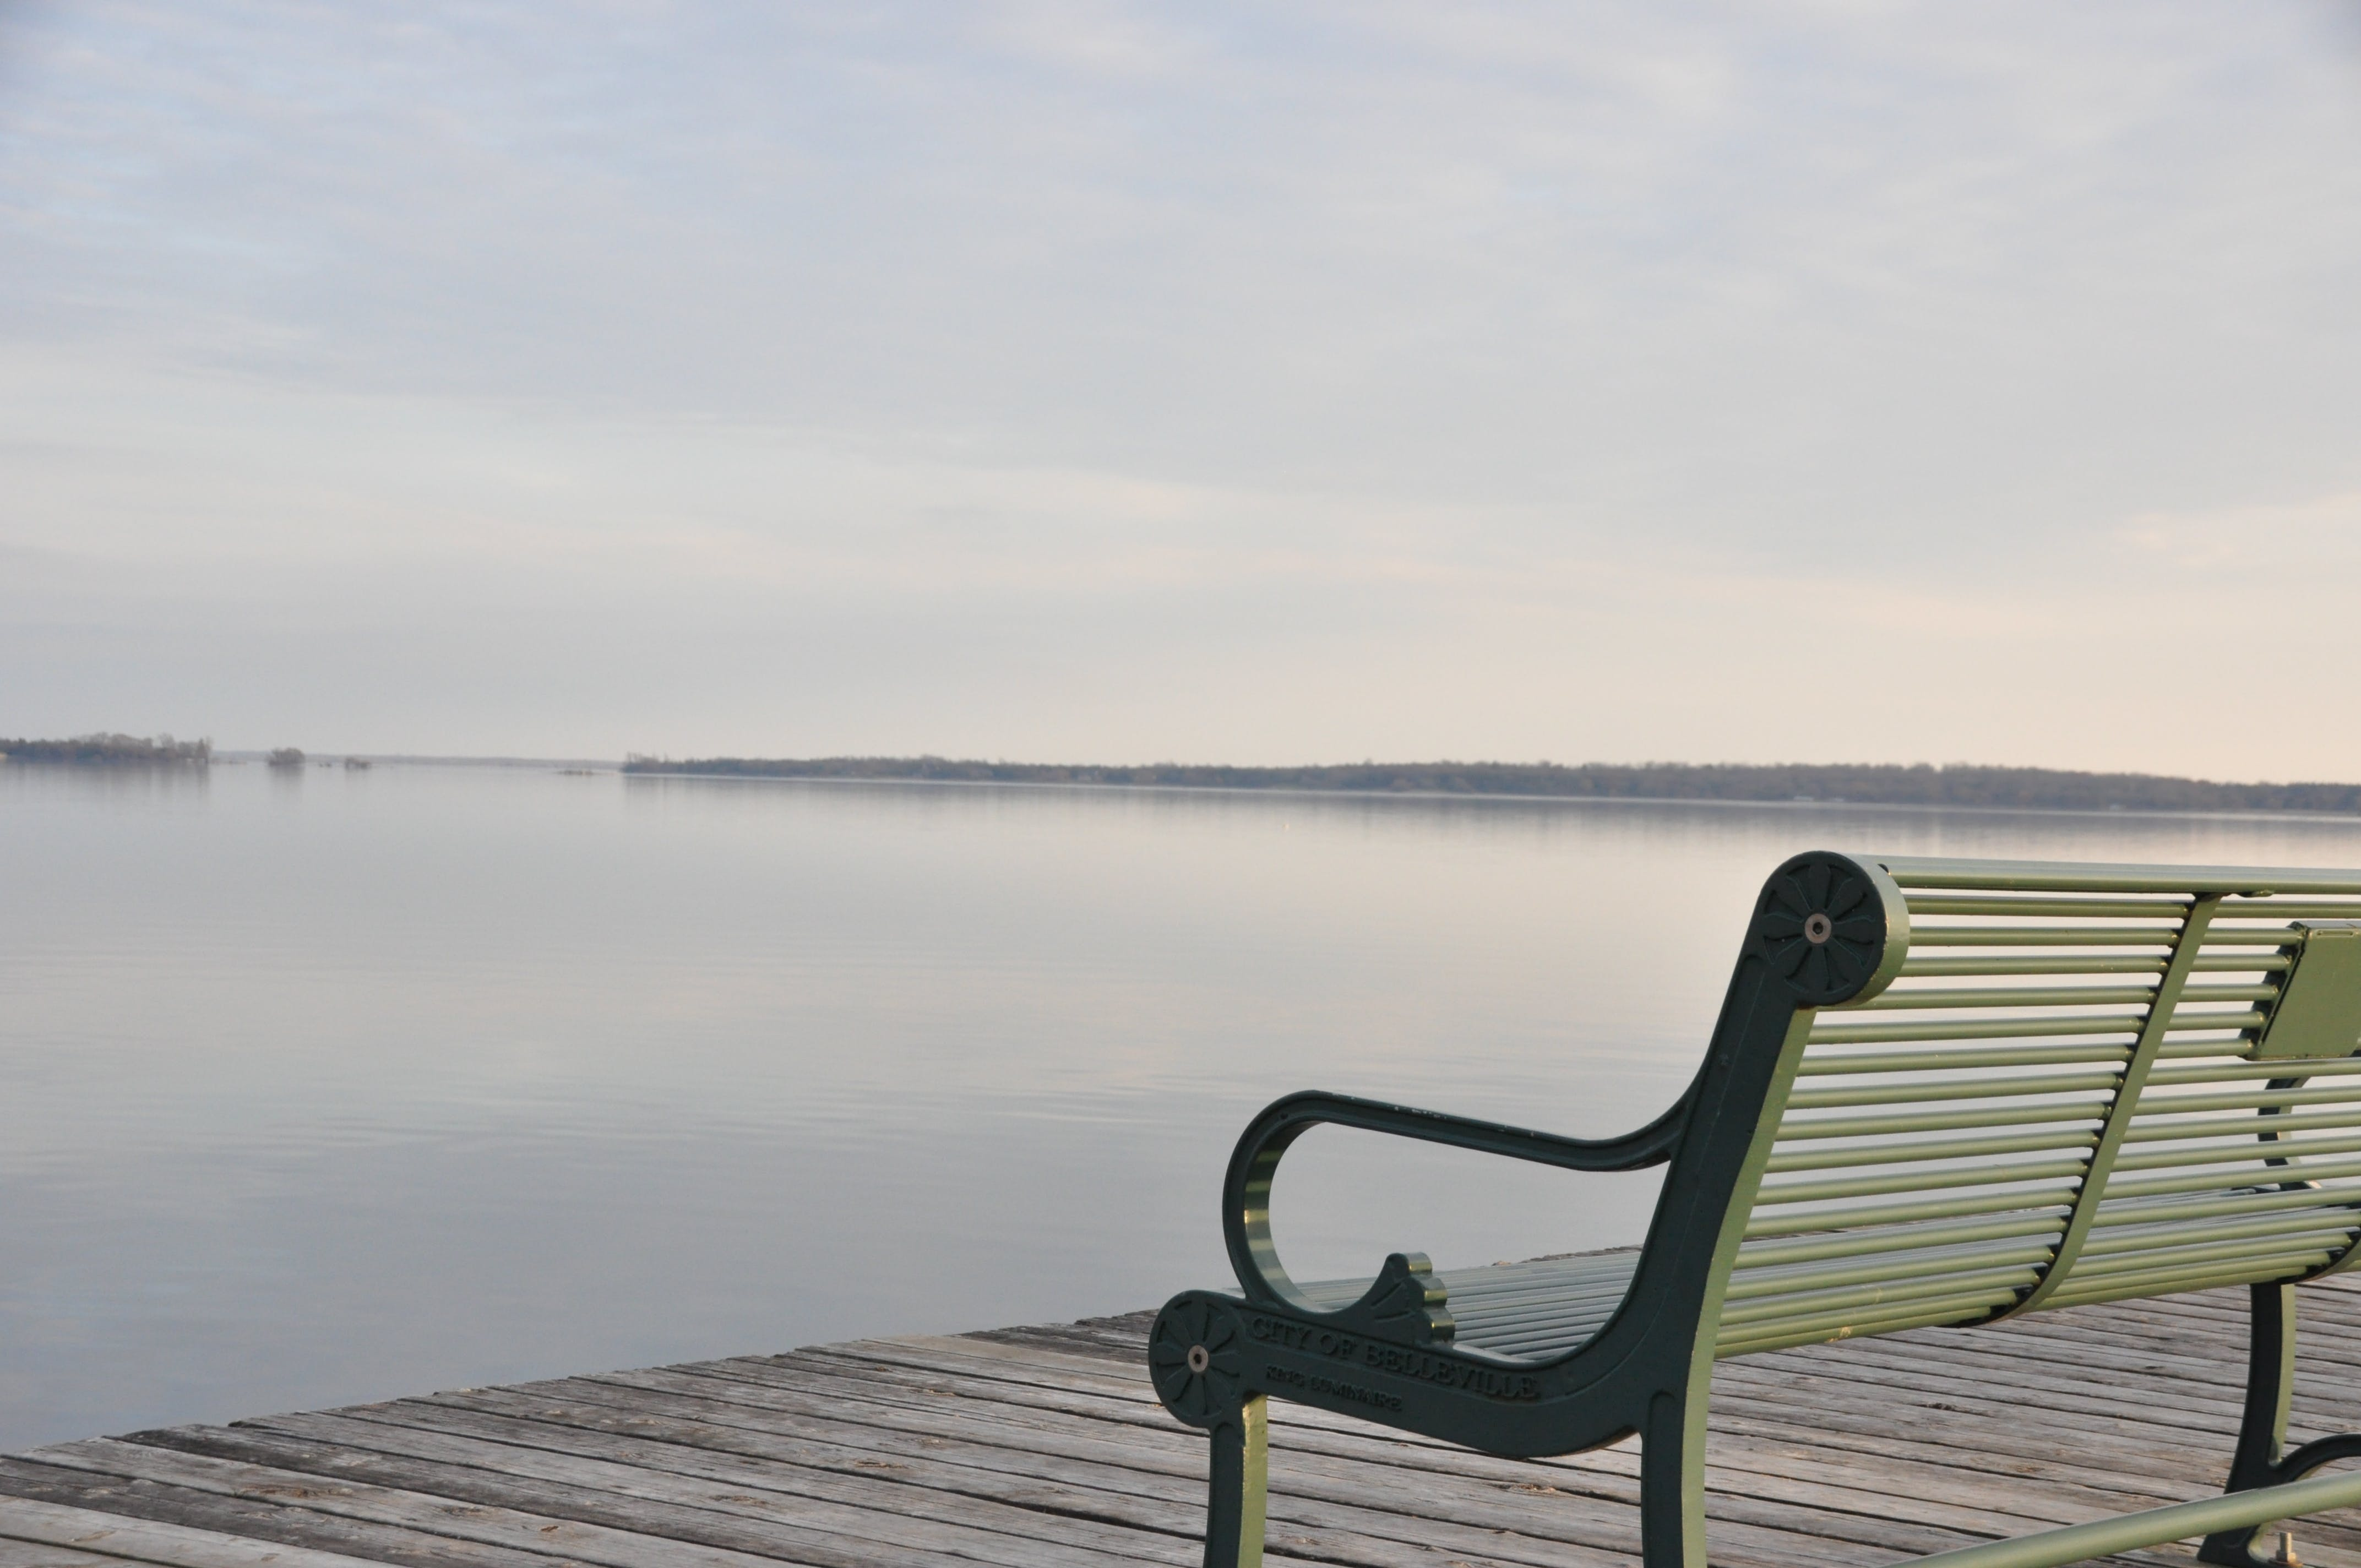 Fotos de stock gratuitas de agua, amanecer, asiento, banco